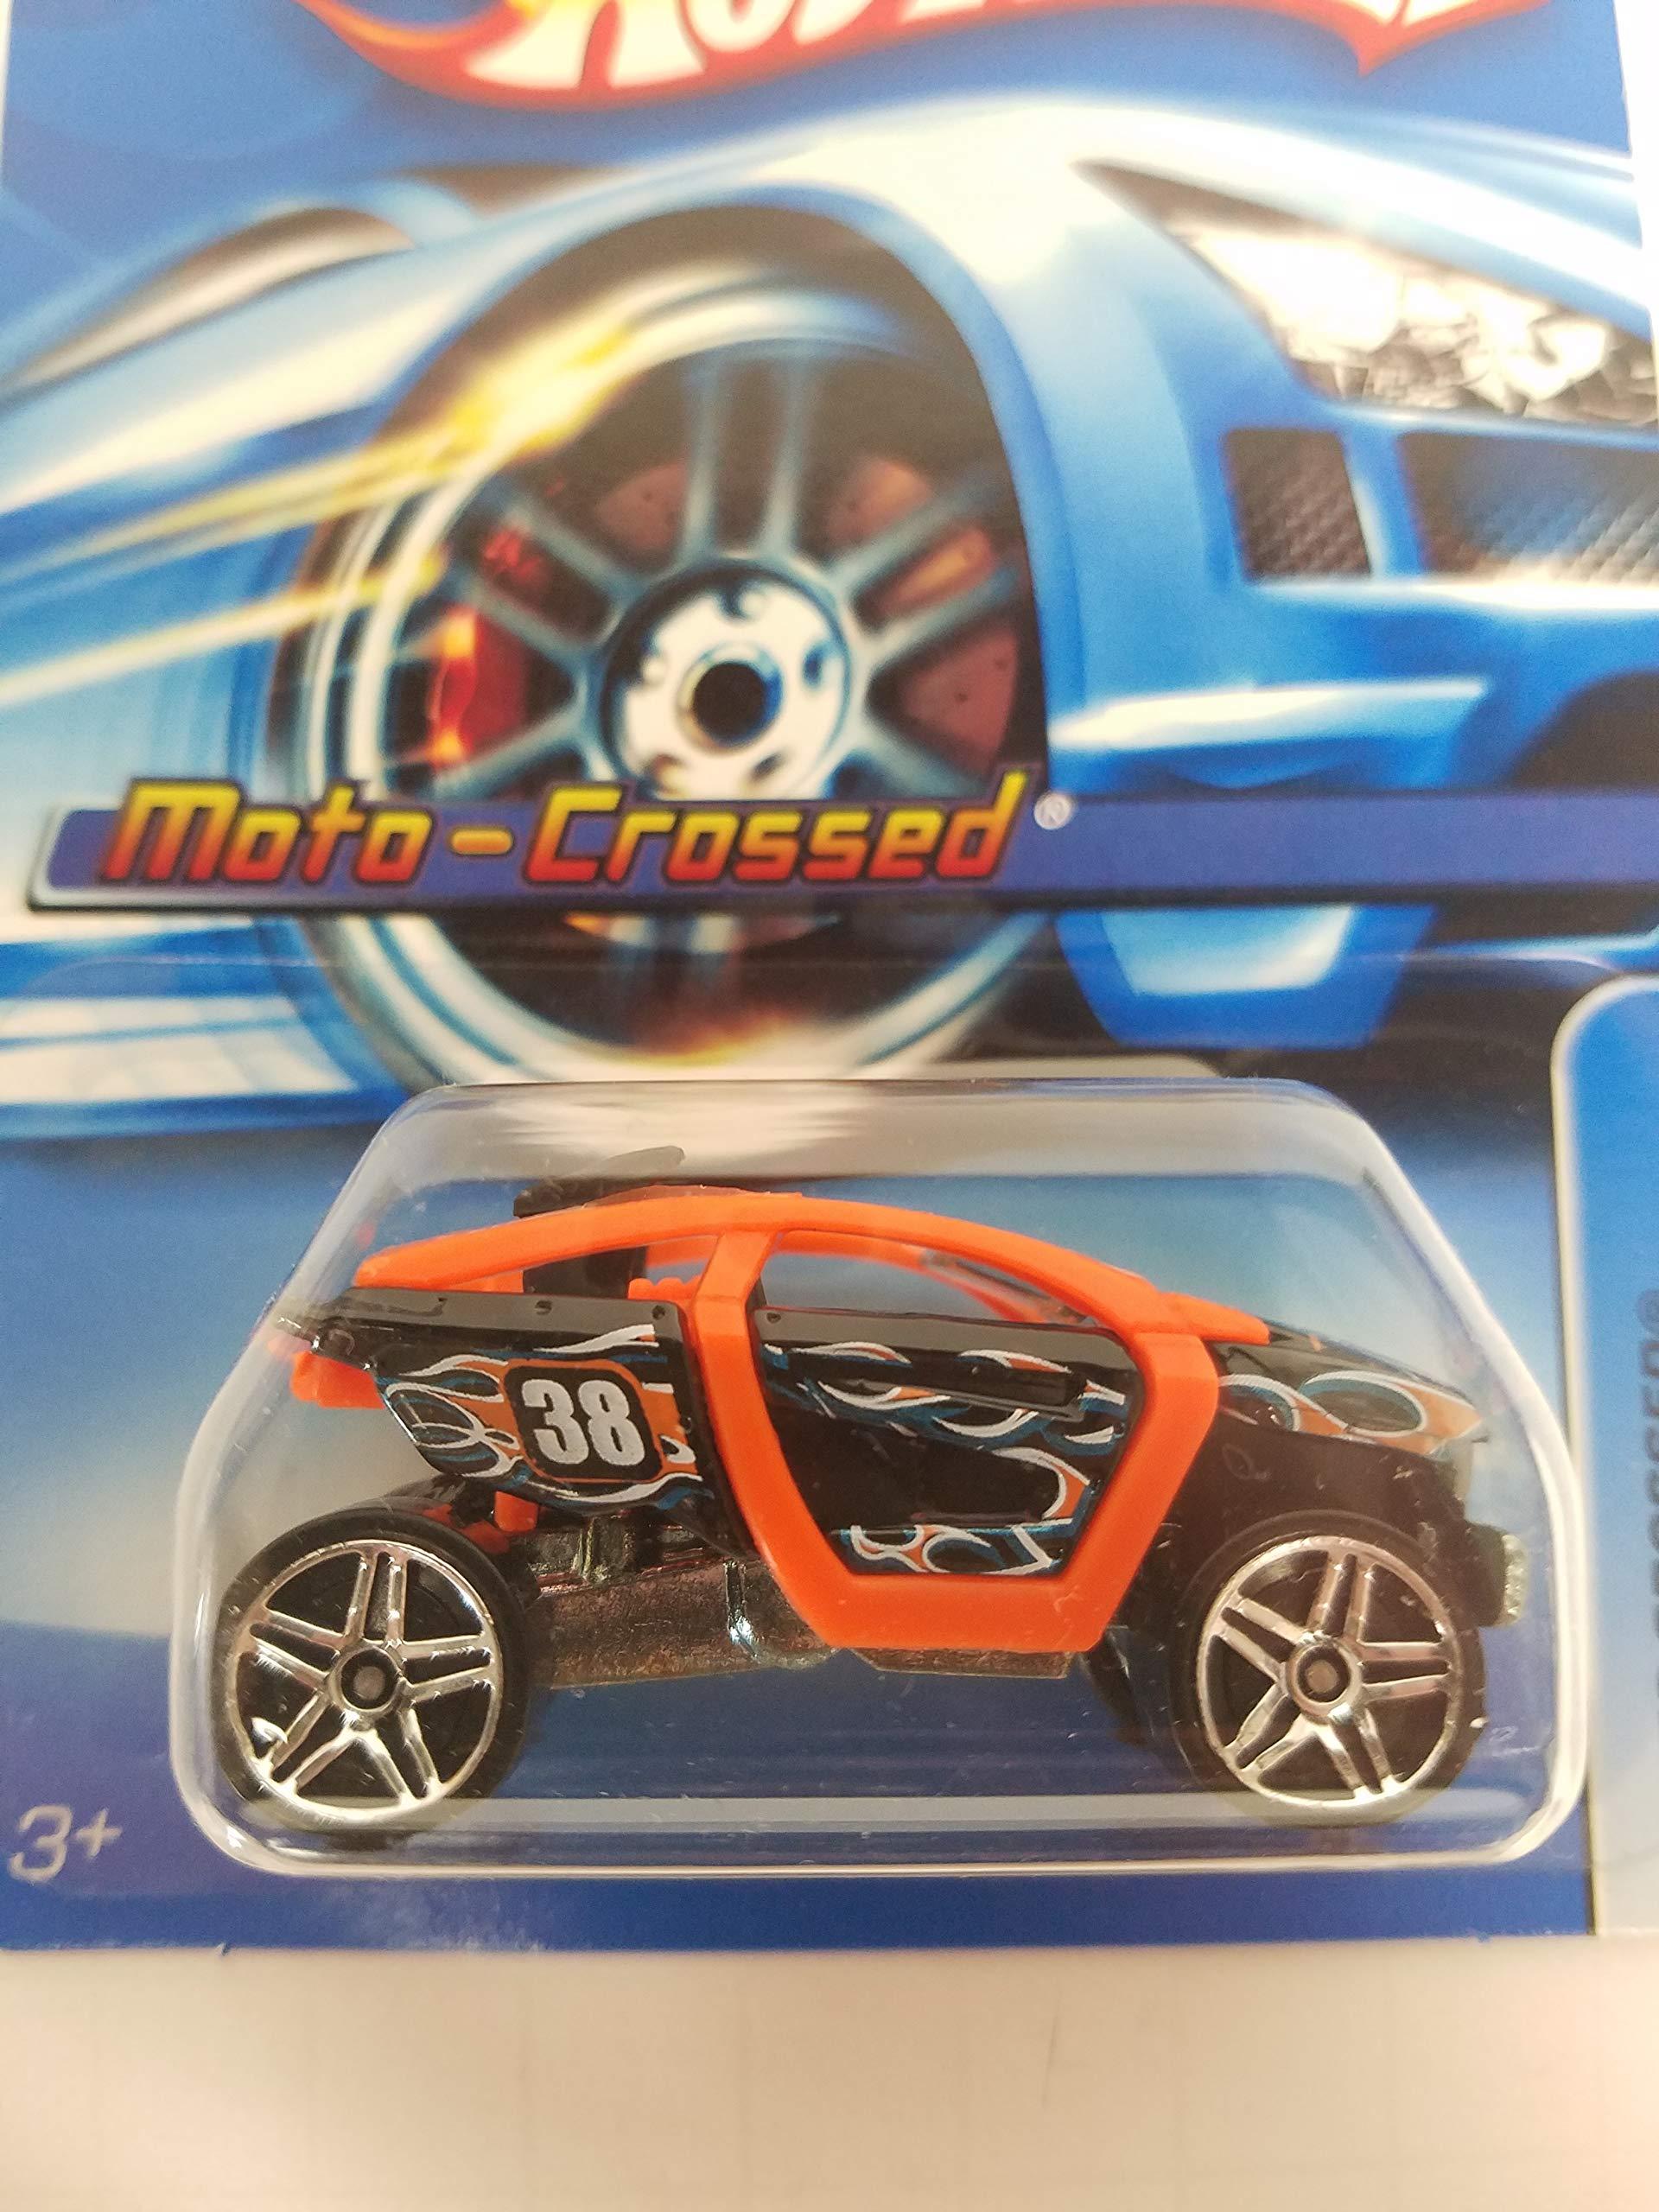 Moto Crossed No.148 Hot Wheels 2006 1/64 scale diecast car